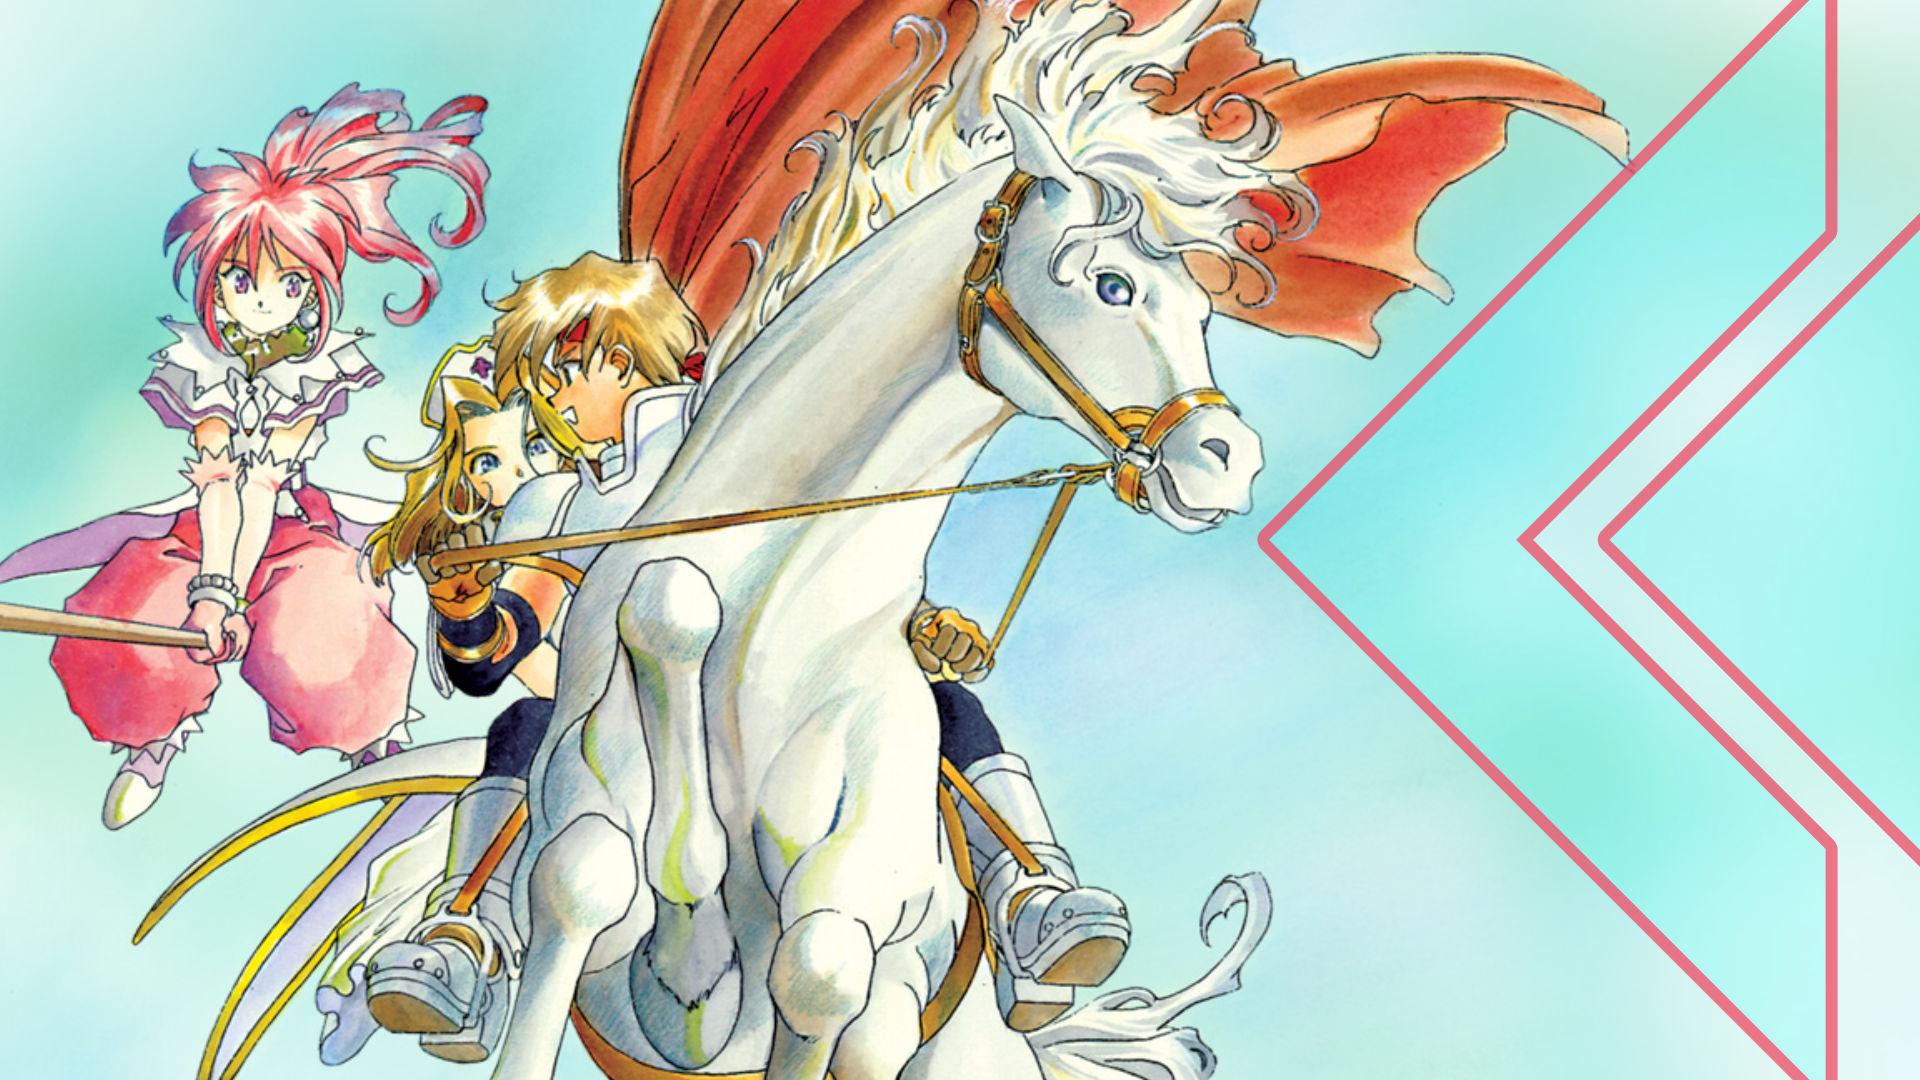 Retro Encounter 266 Tales of Phantasia